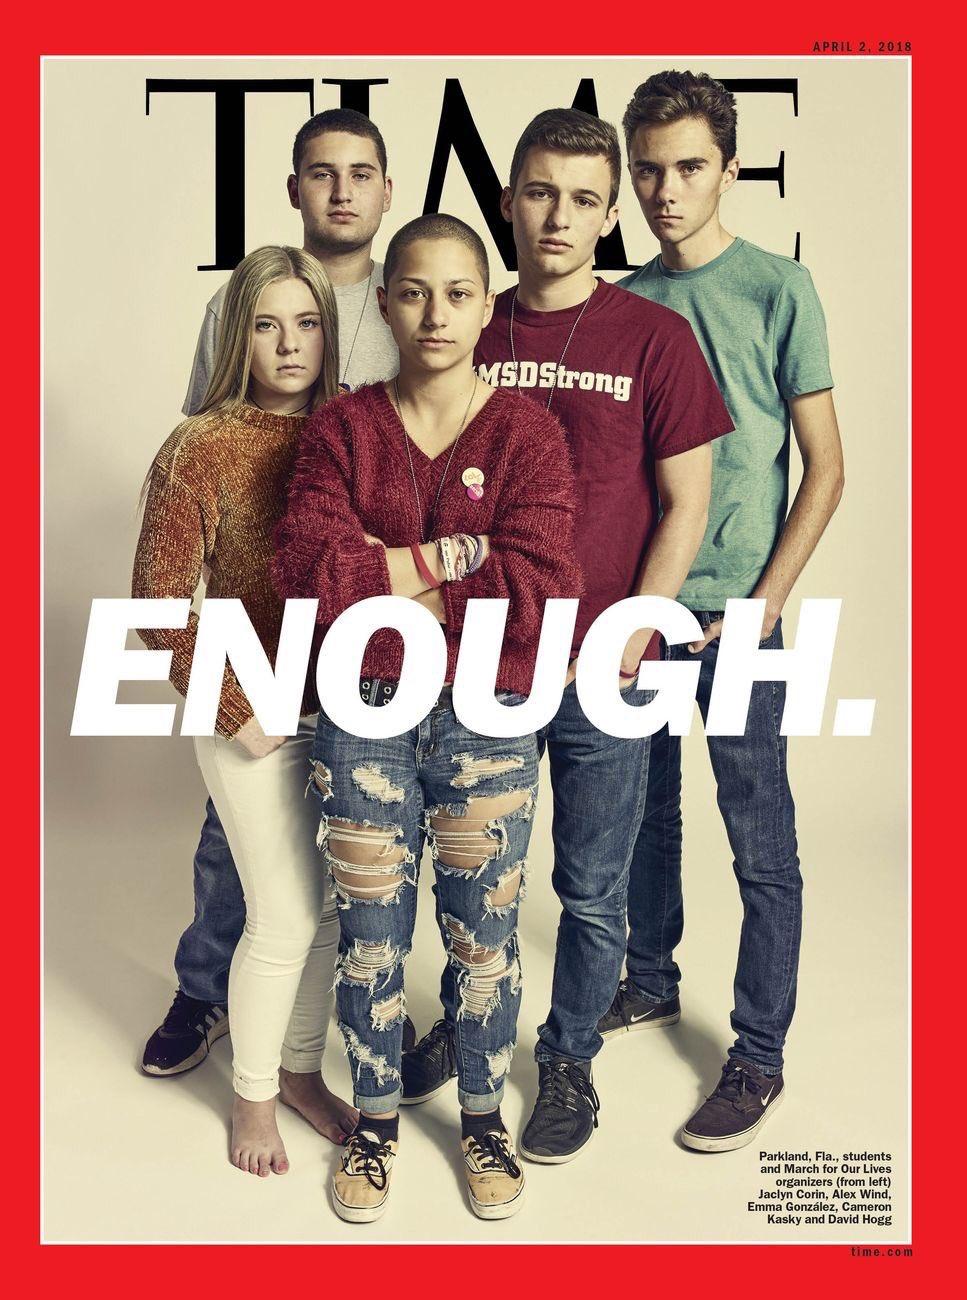 The new cover of @TIME. https://t.co/qredn4SqI3 https://t.co/QS63VWWTj3